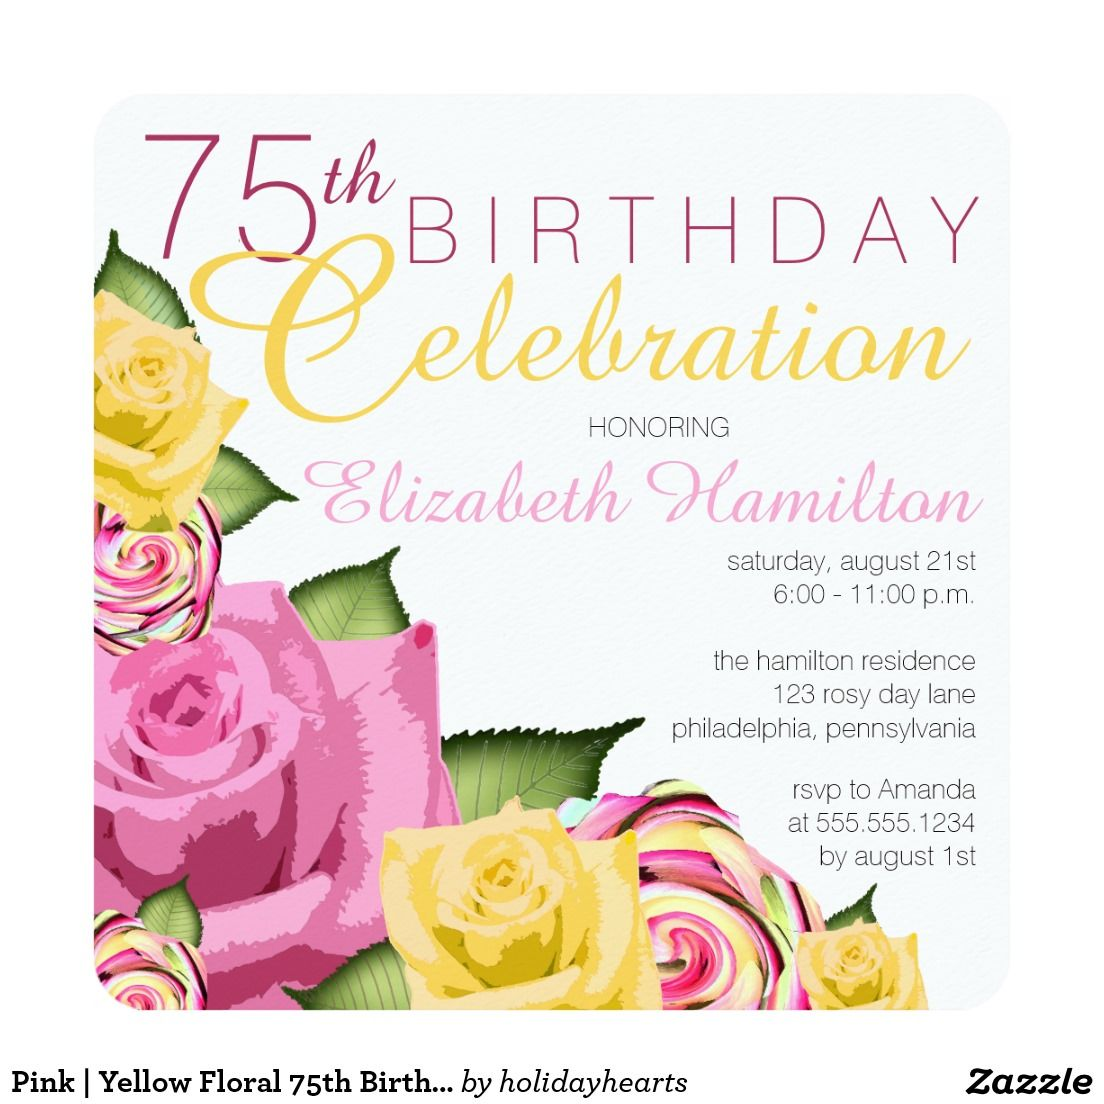 Yellow Floral 75th Birthday Celebration Card